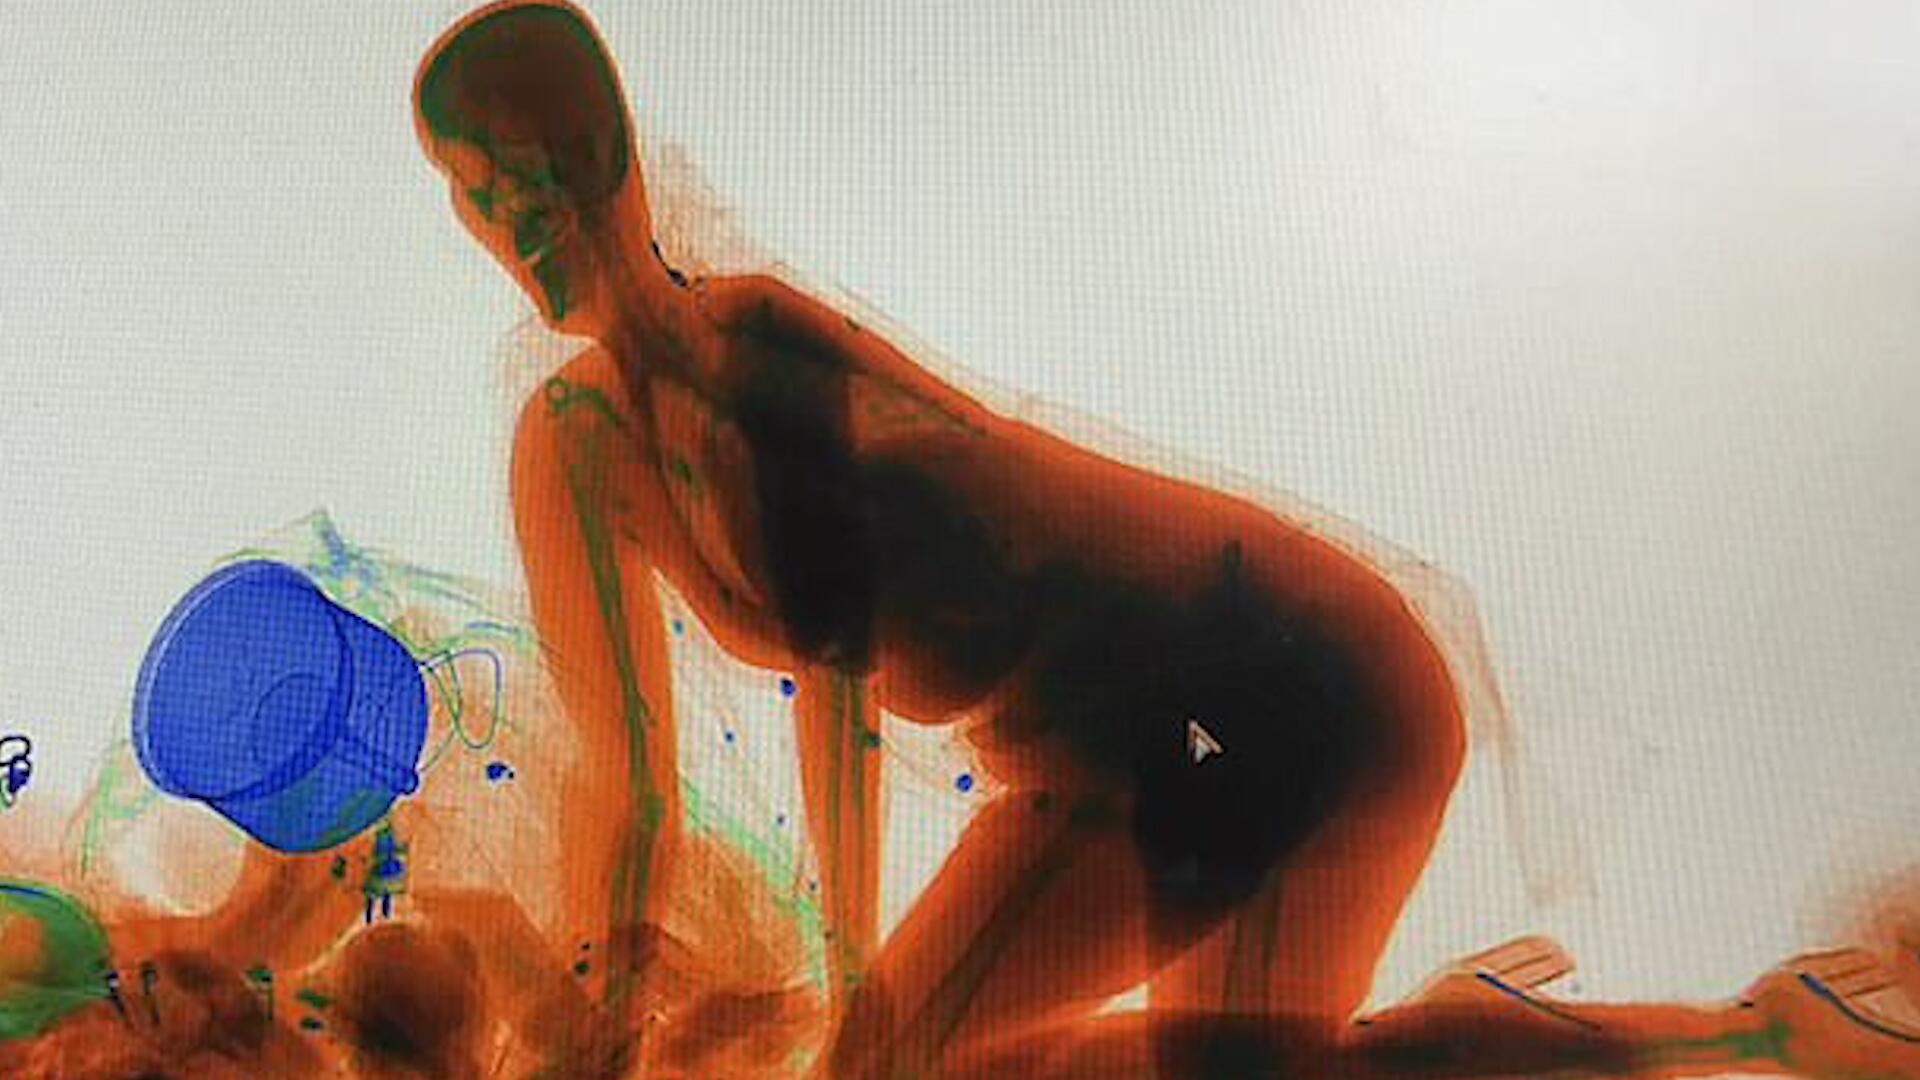 Bild zu Handtasche weg? Chinesin klettert in Gepäck-Röntgengerät